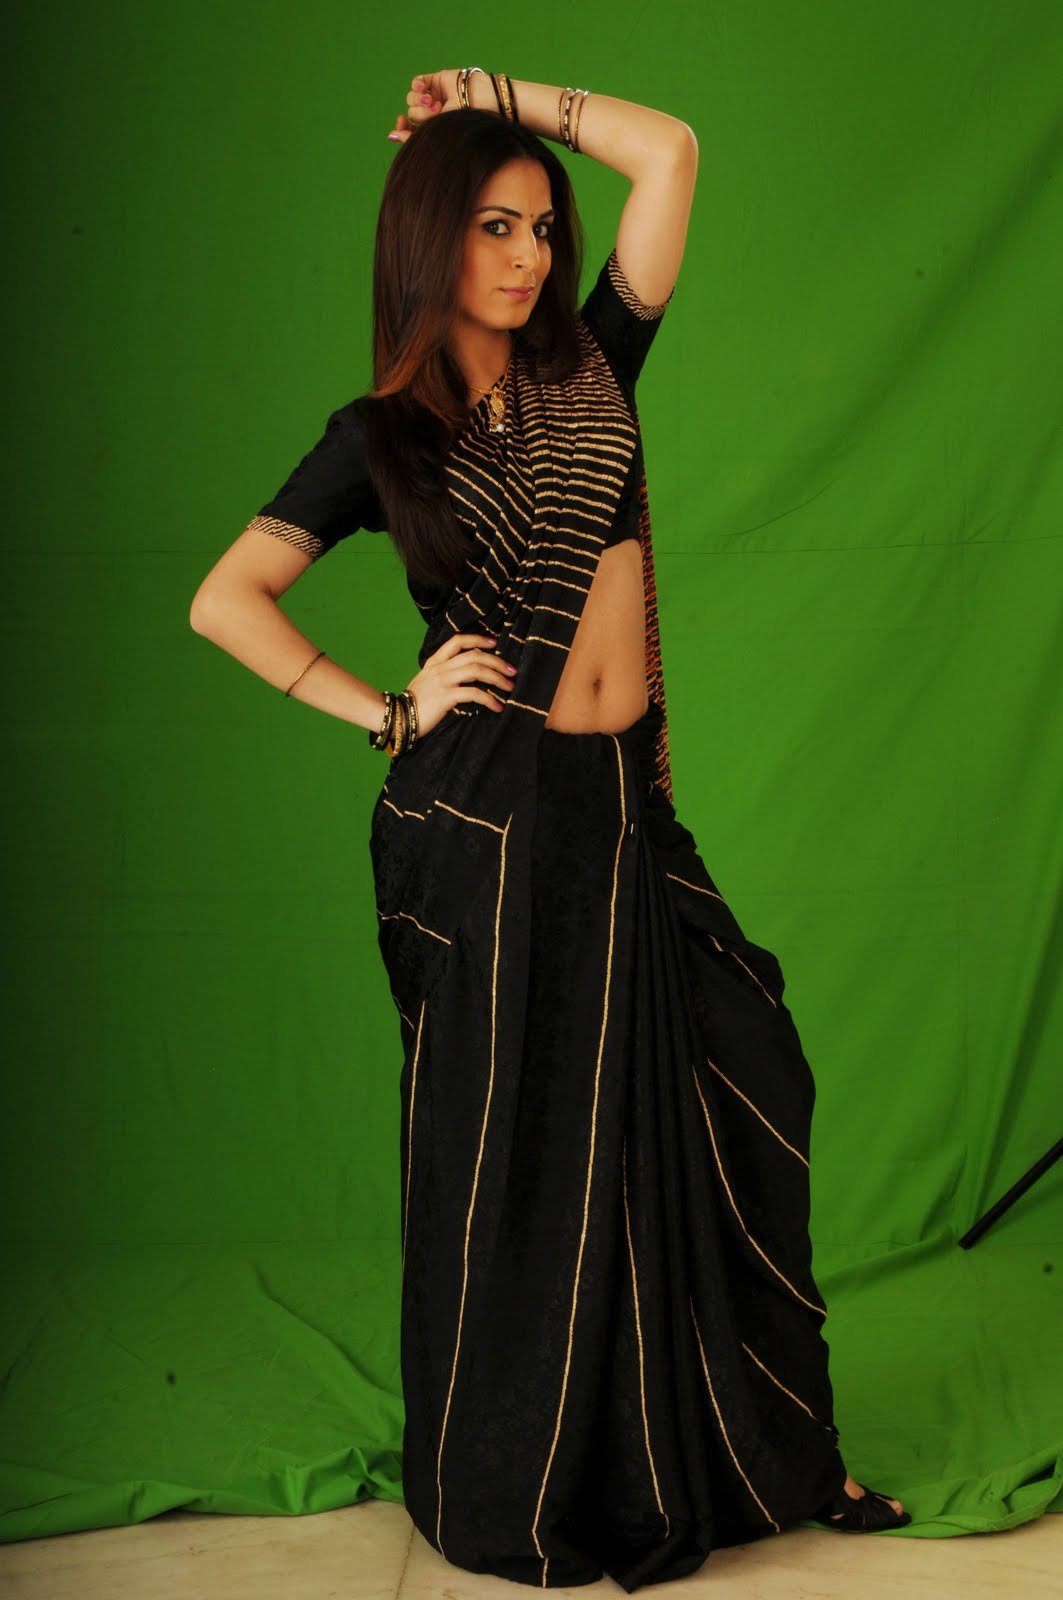 Shraddha arya photoshoot in black saree